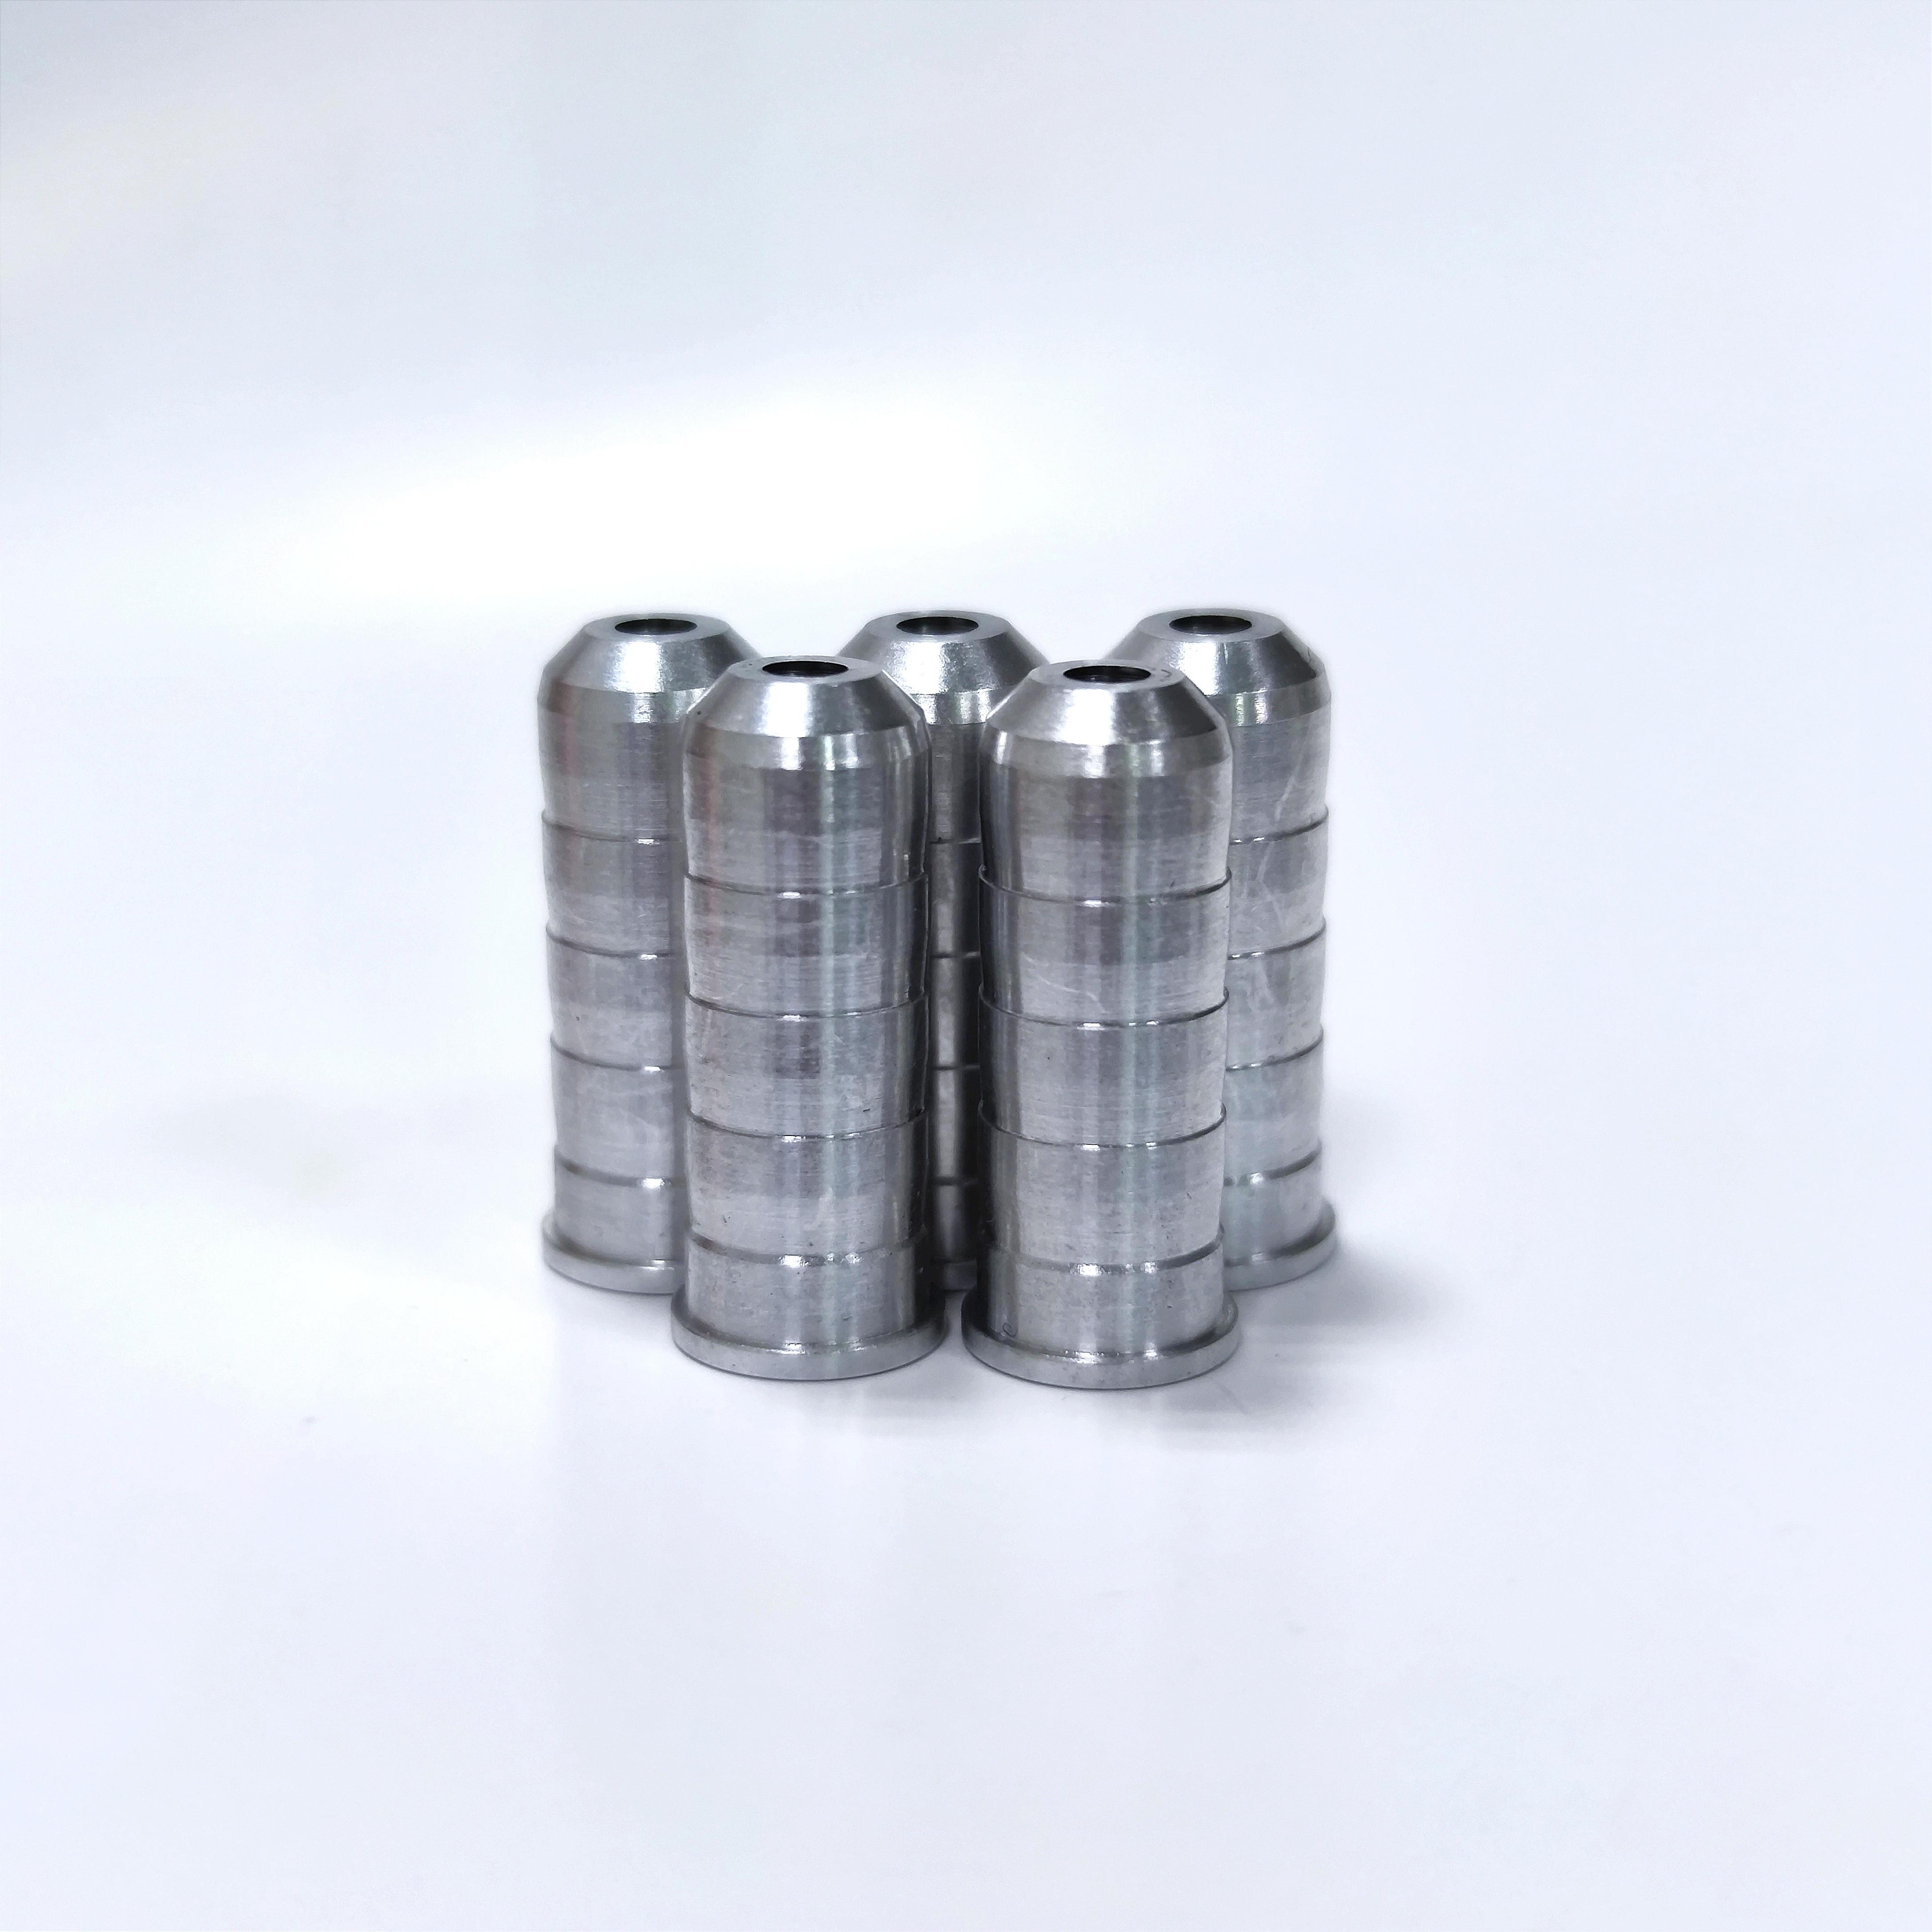 CNC Turning Machining  Aluminum Parts Precision CNC Turned Component